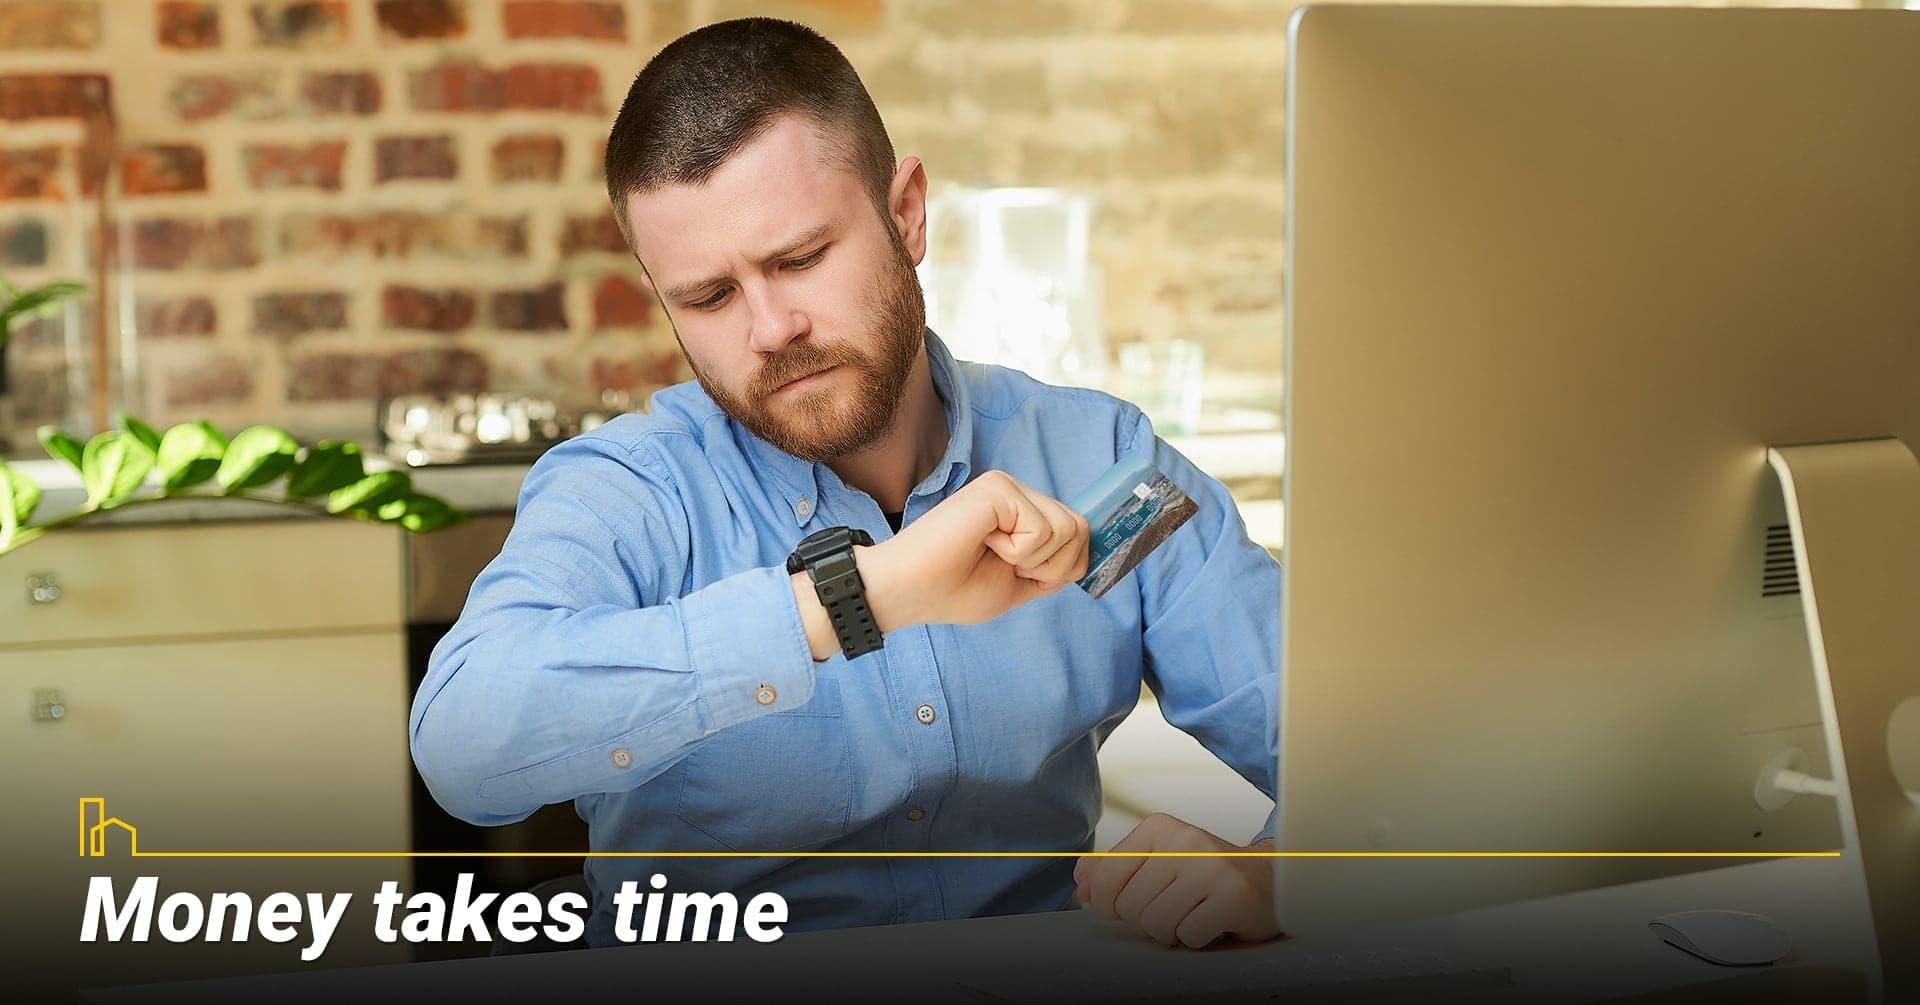 Money takes time, expect longer timeline